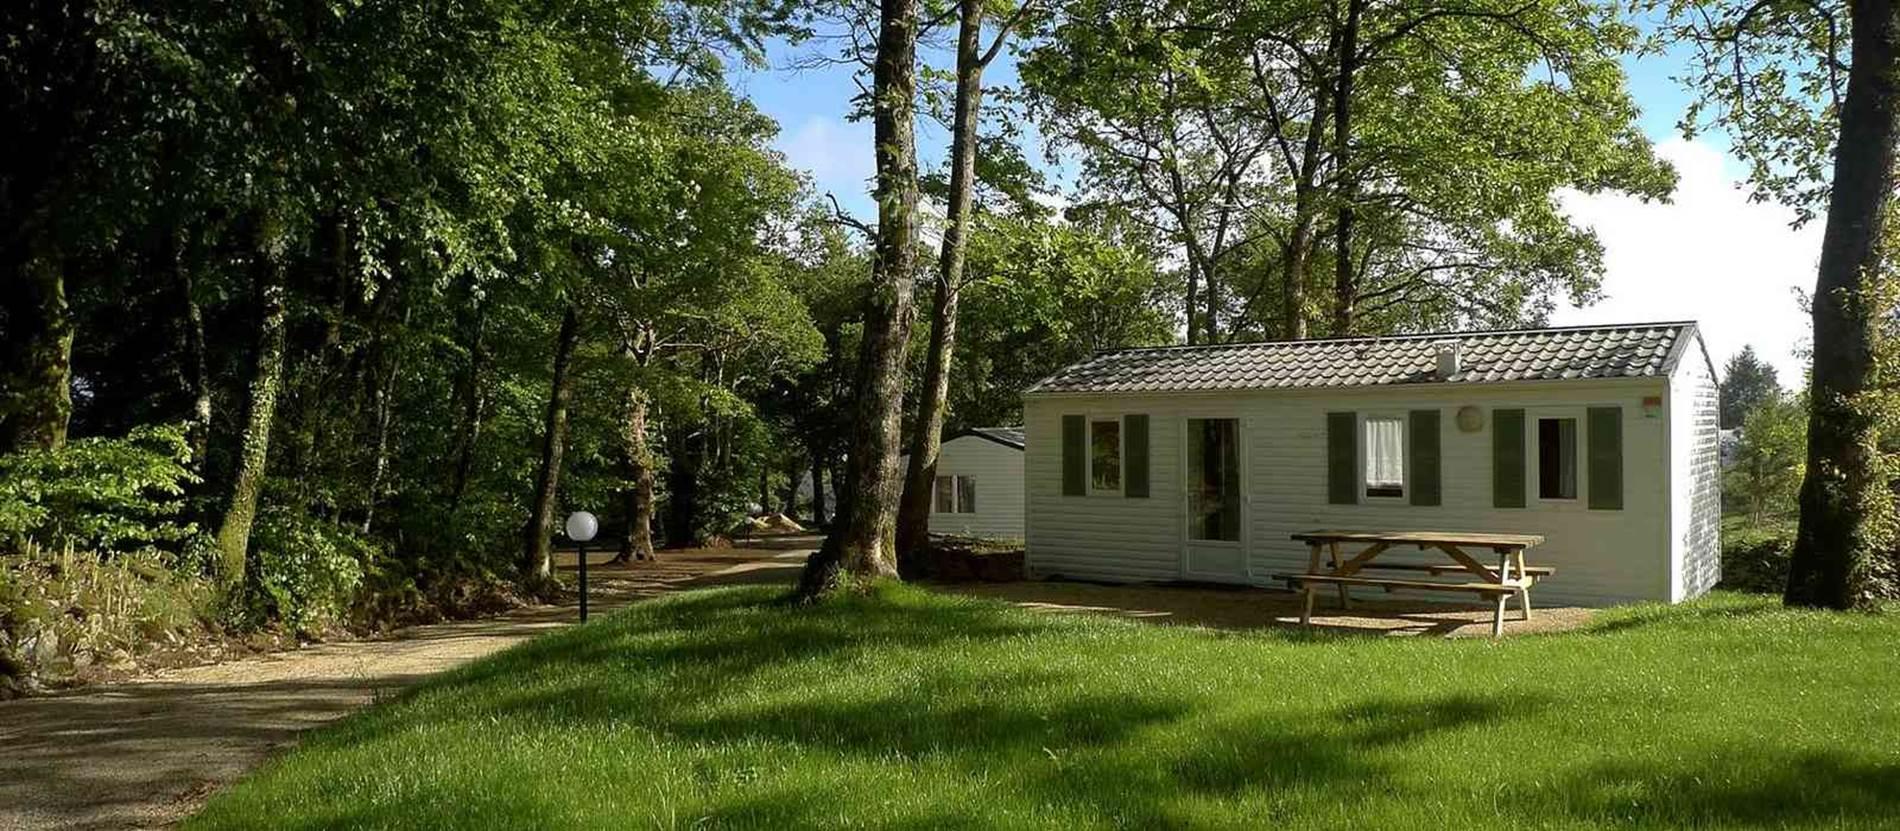 Camping de Pont Calleck Plouay © Camping Pont Calleck